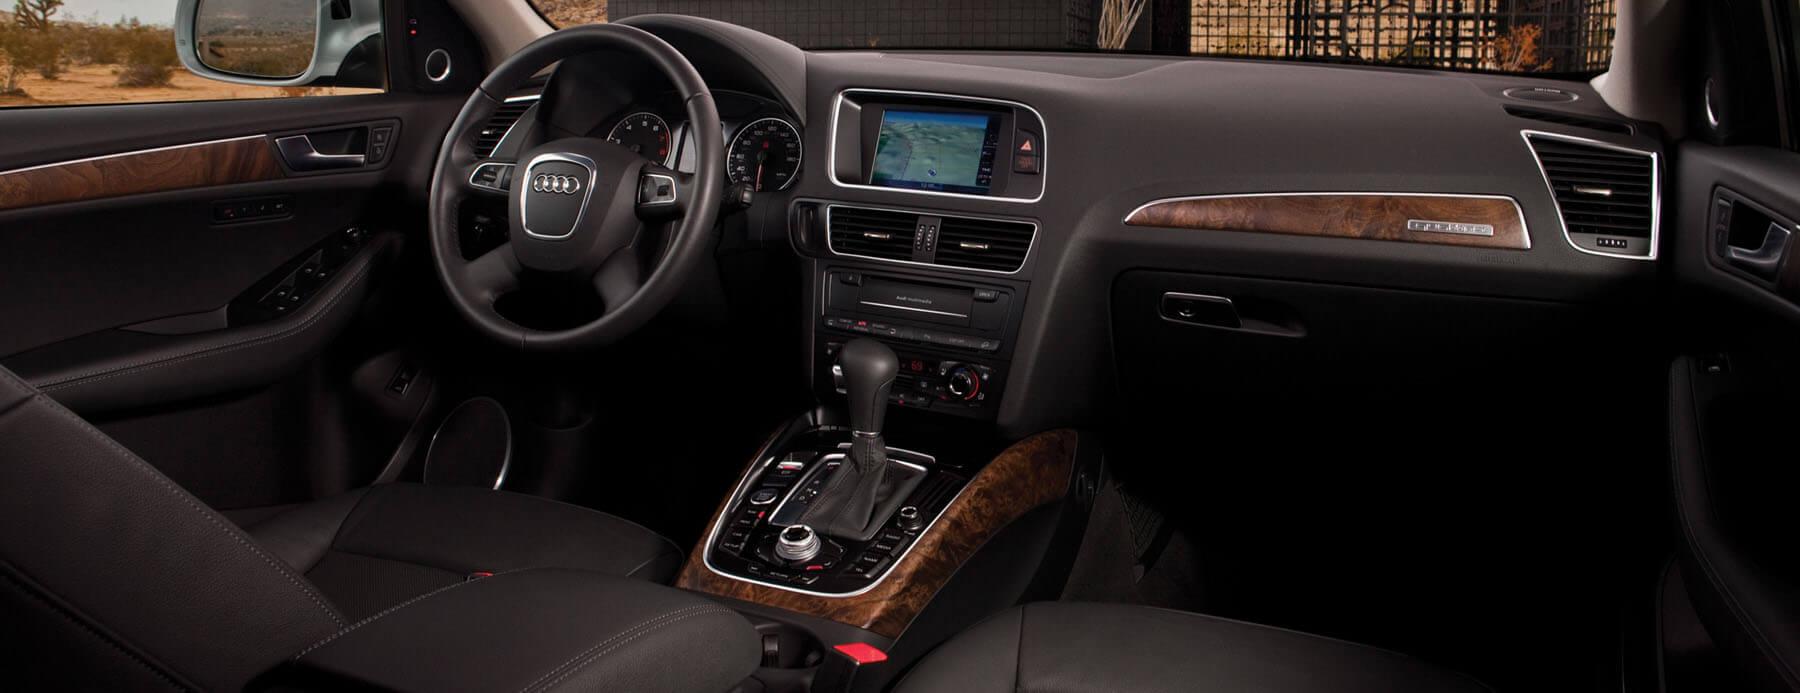 Audi A3 Interior Trim Kit | Billingsblessingbags.org